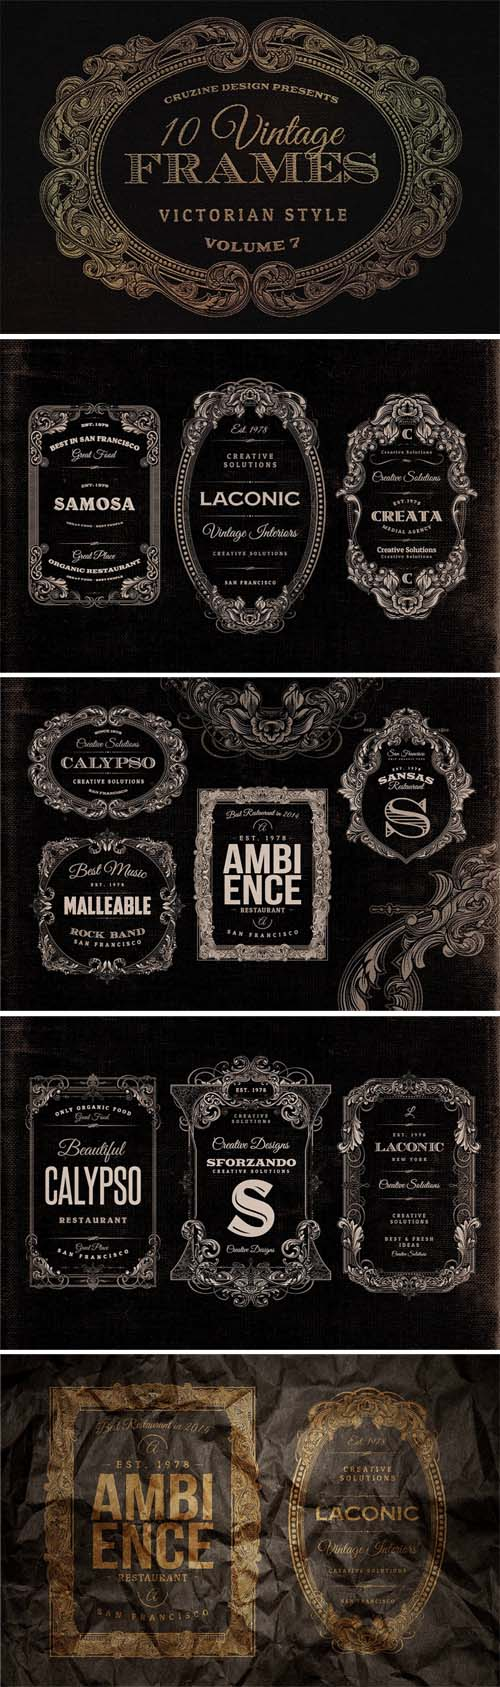 Vintage Frames Victorian Ornament Style